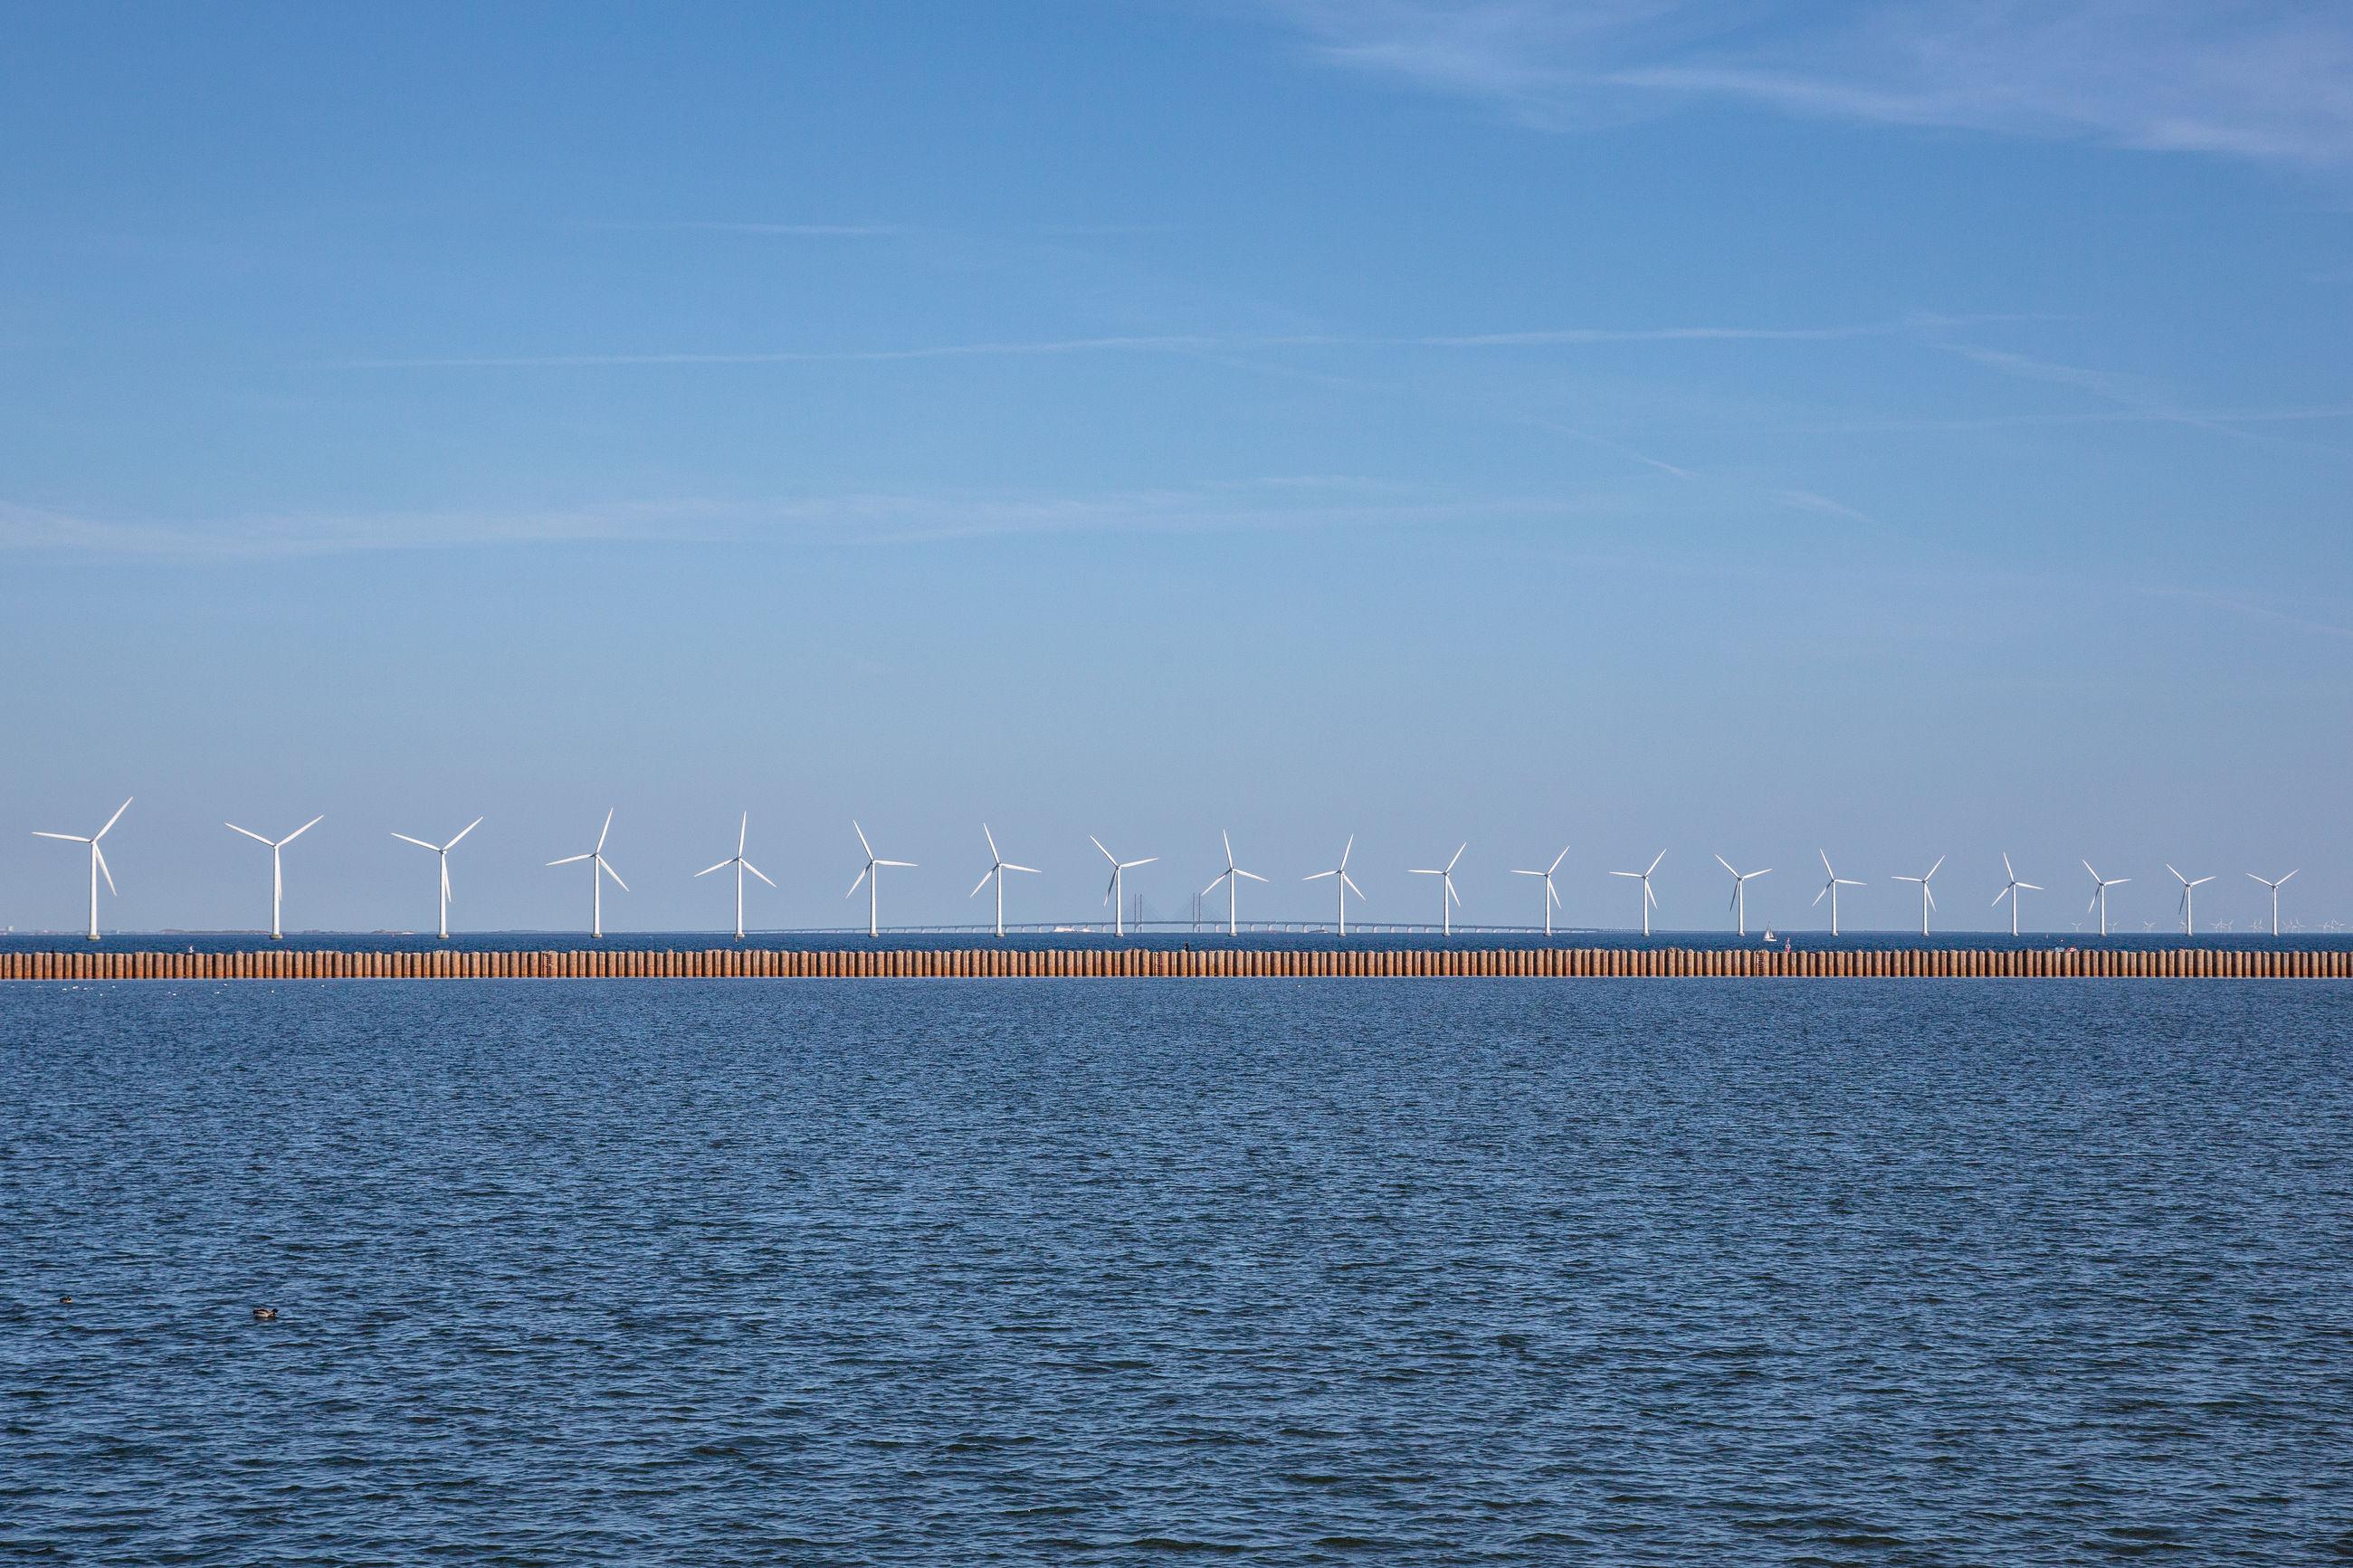 View of wind turbines on sea against blue sky